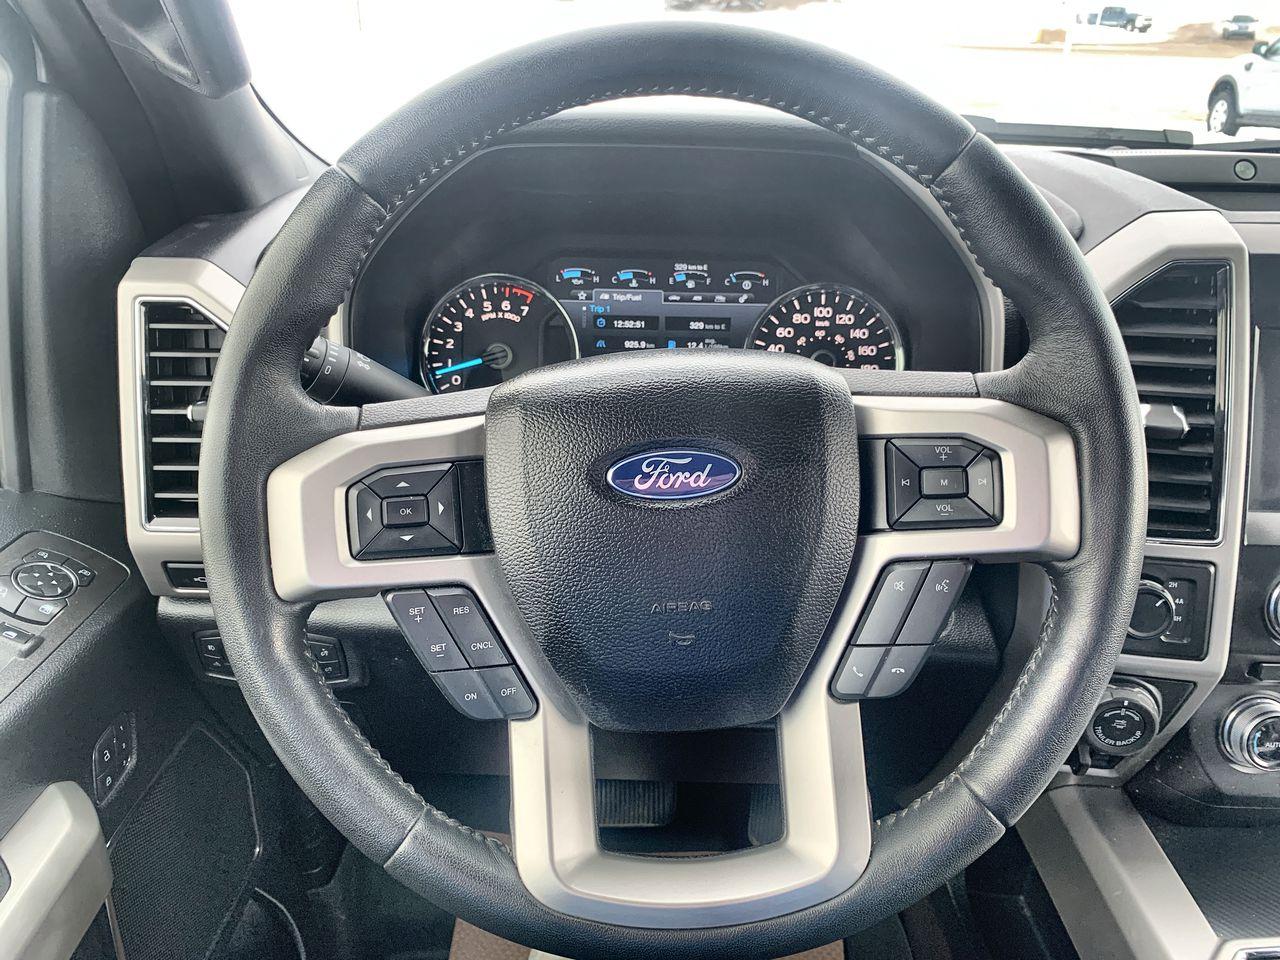 2018 Ford F-150 4 Door Pickup